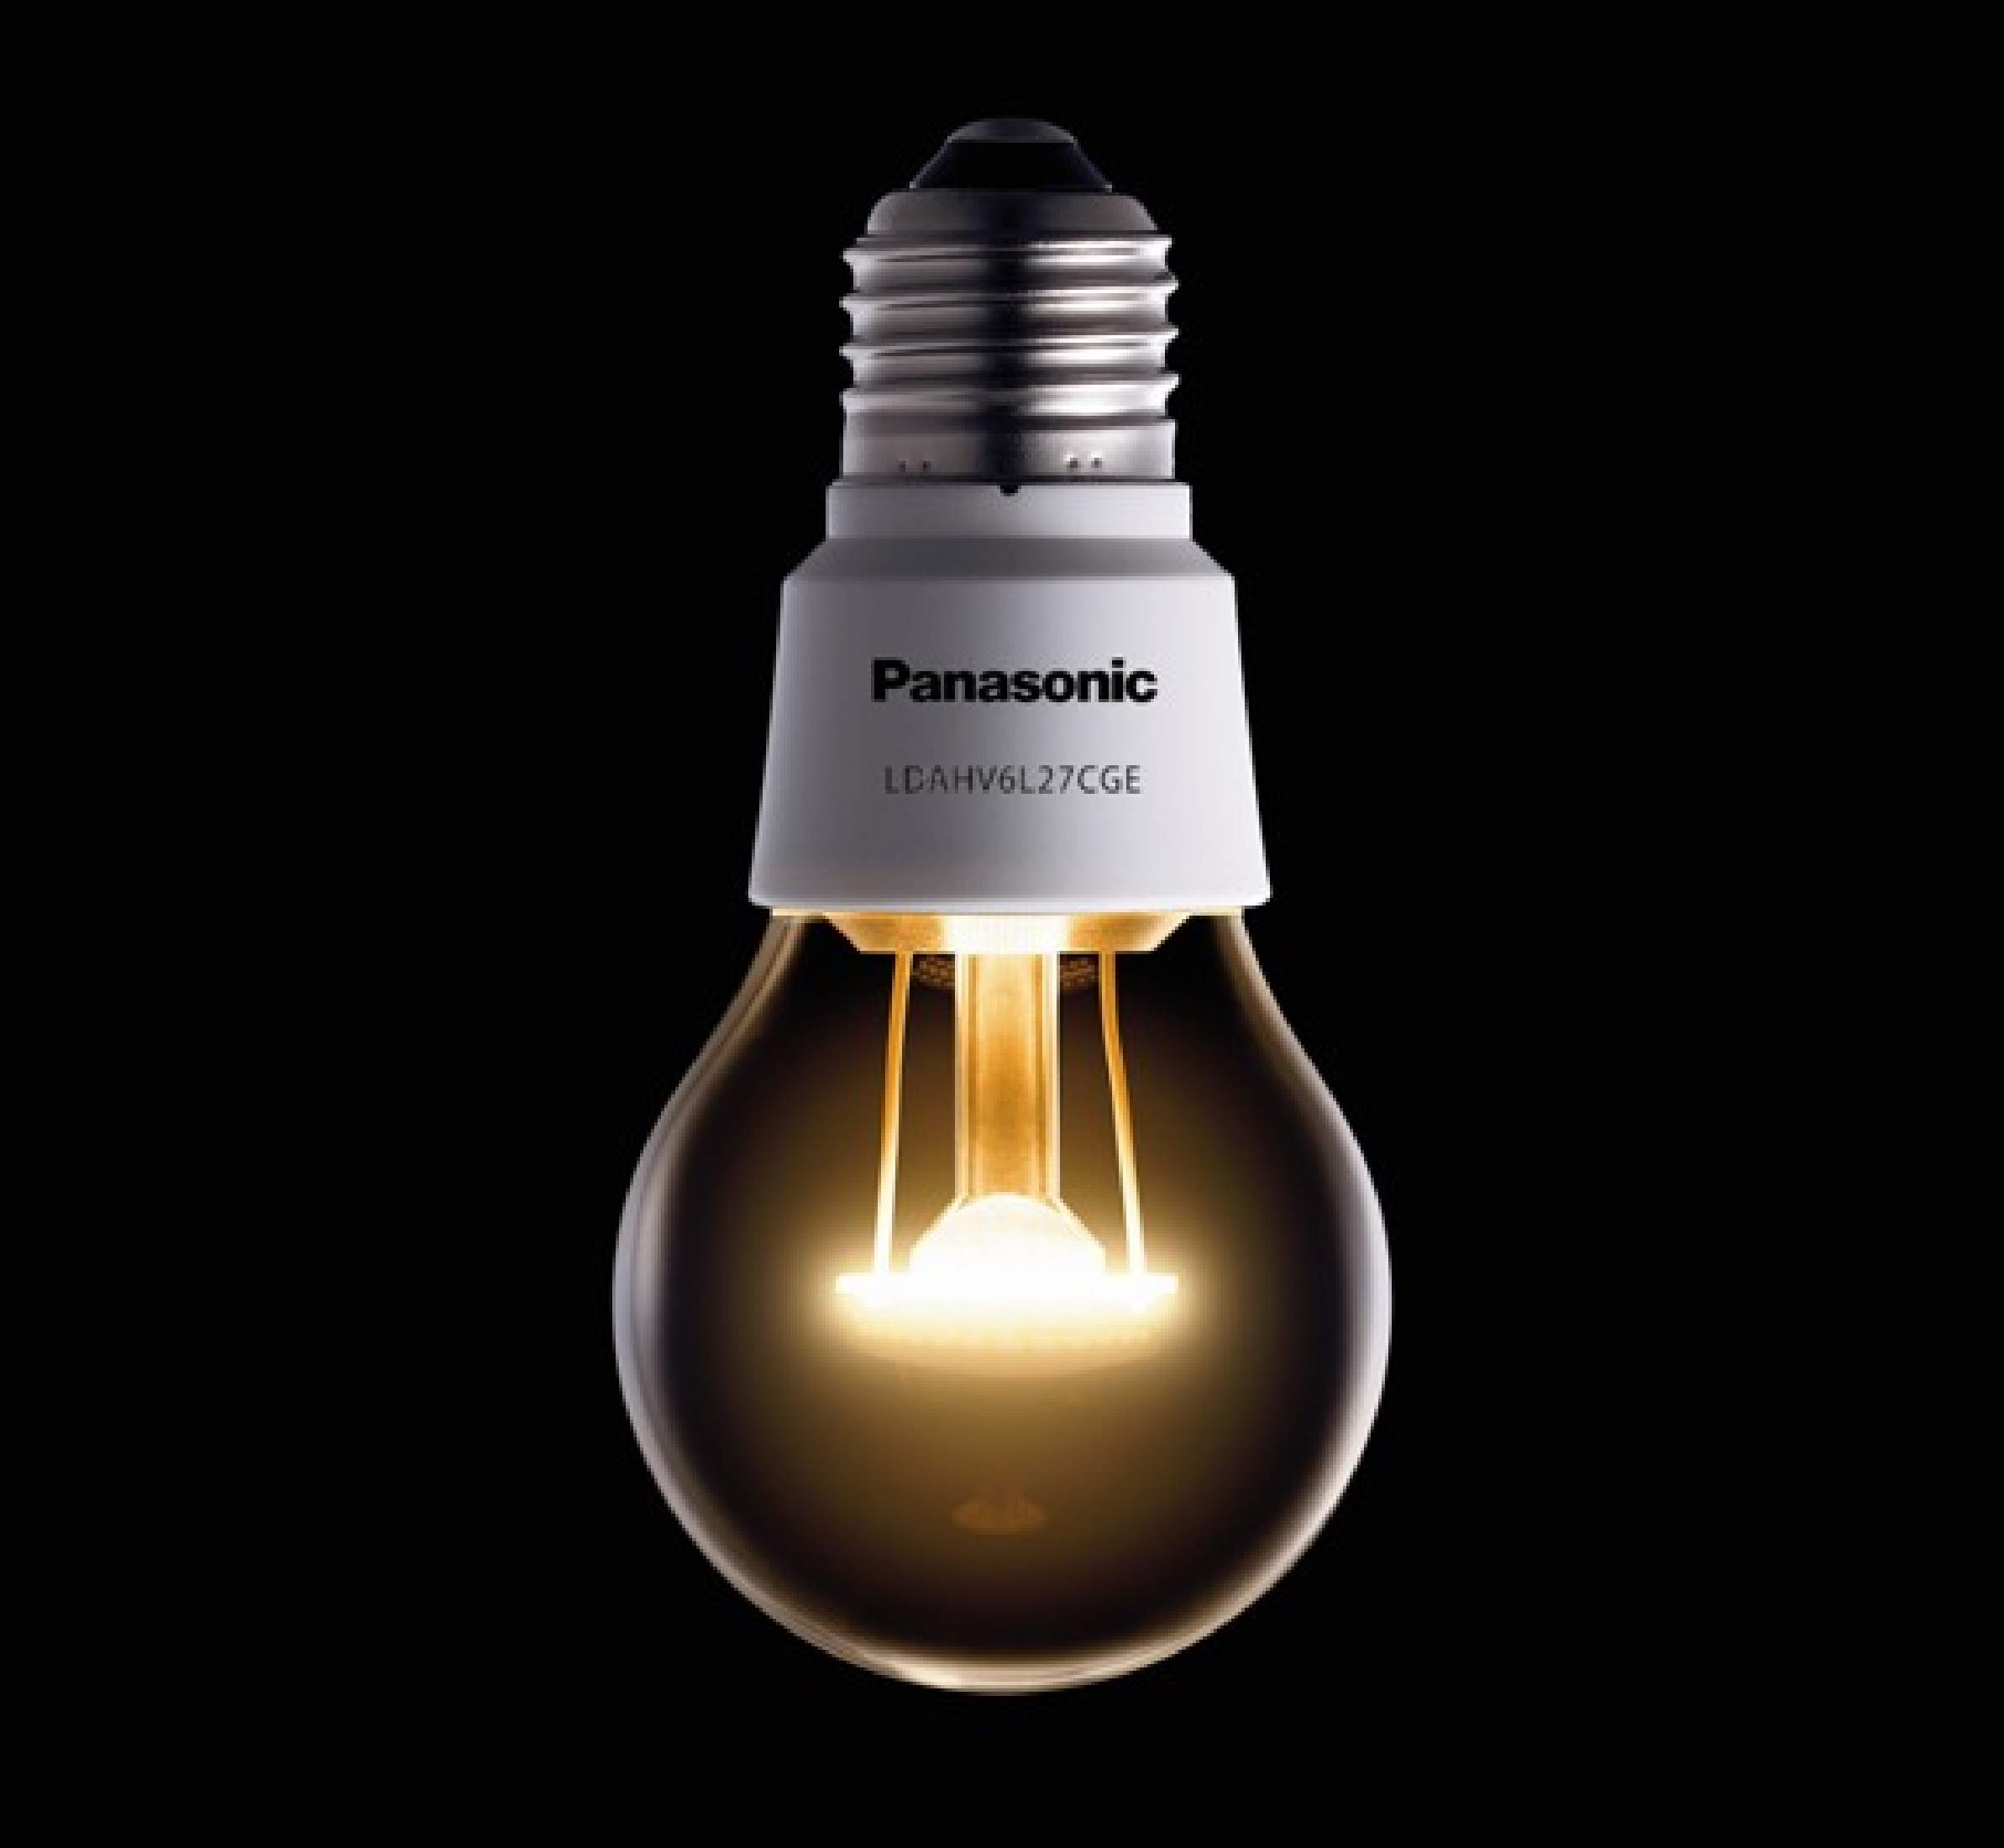 Panasonic S Nostalgic Clear Led Bulb Recognised With If